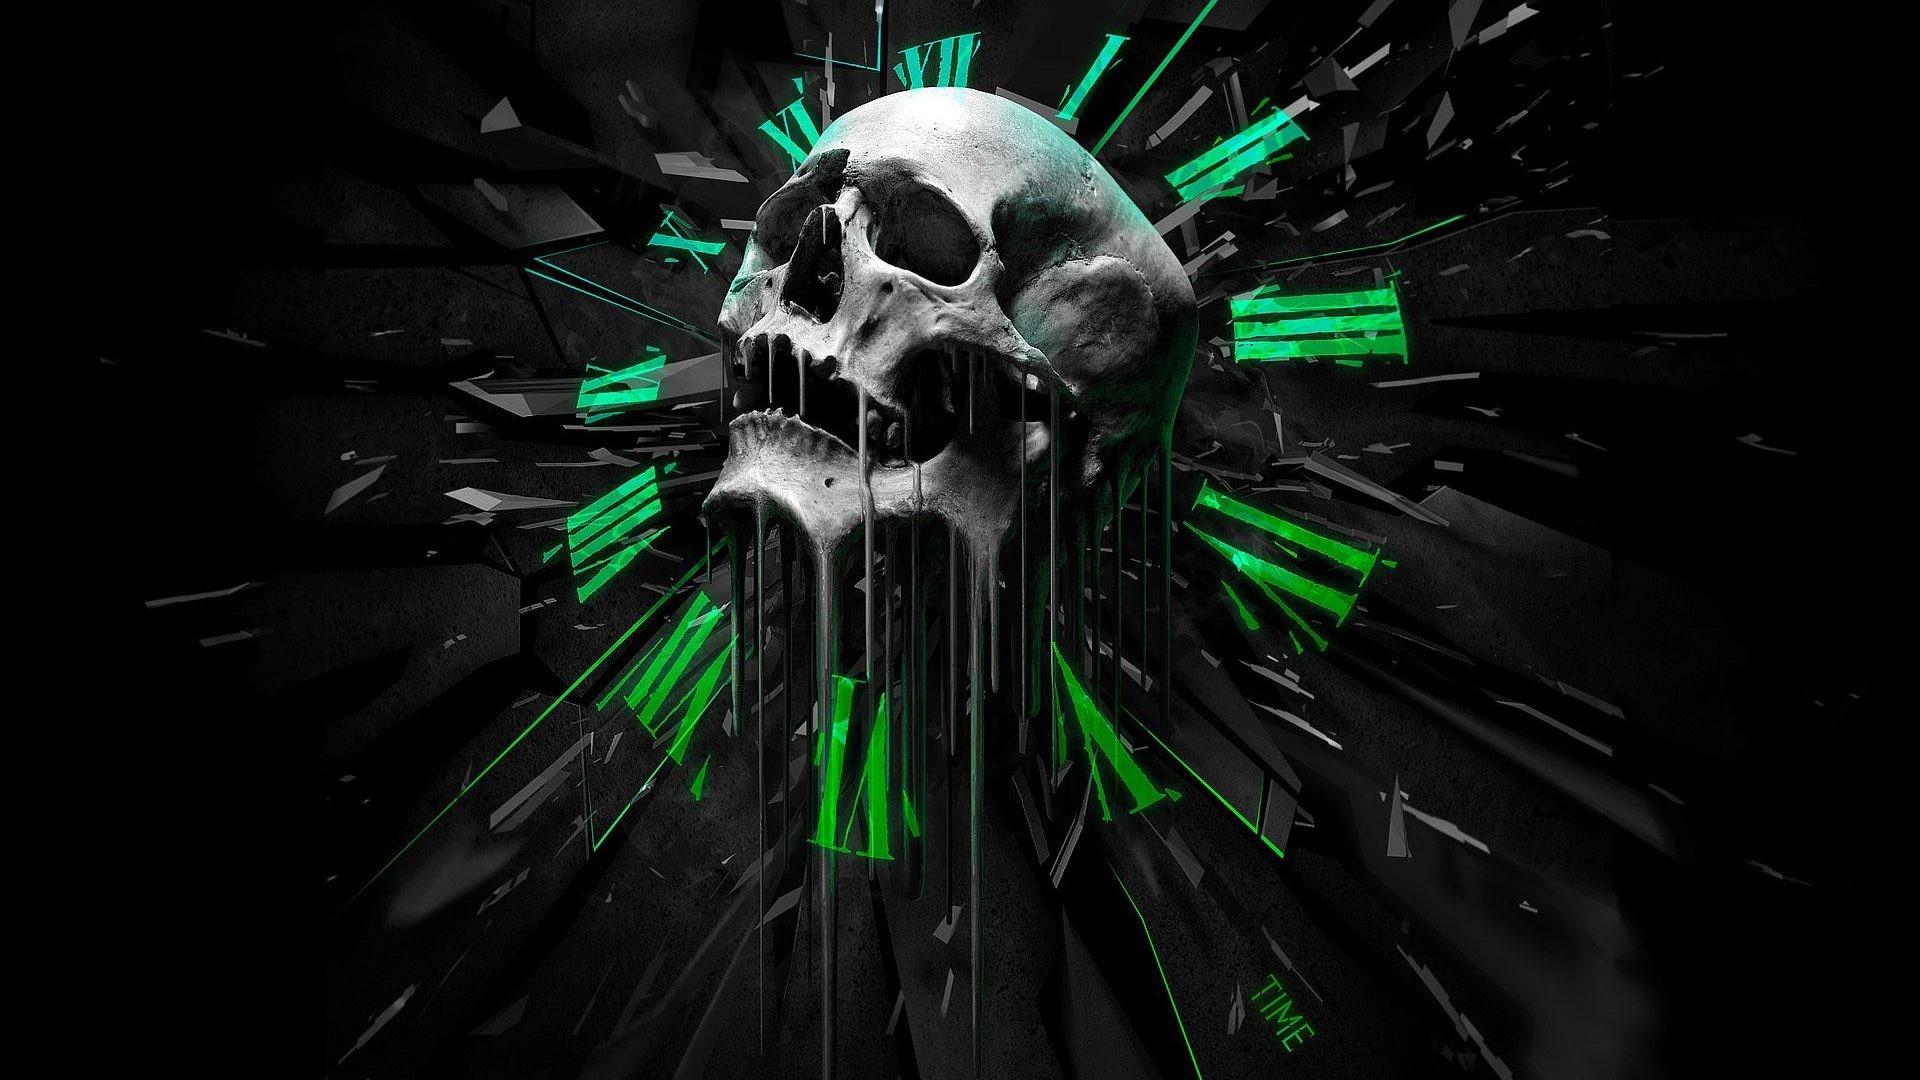 Skulls and guns wallpaper 59 images - Skull 4k images ...